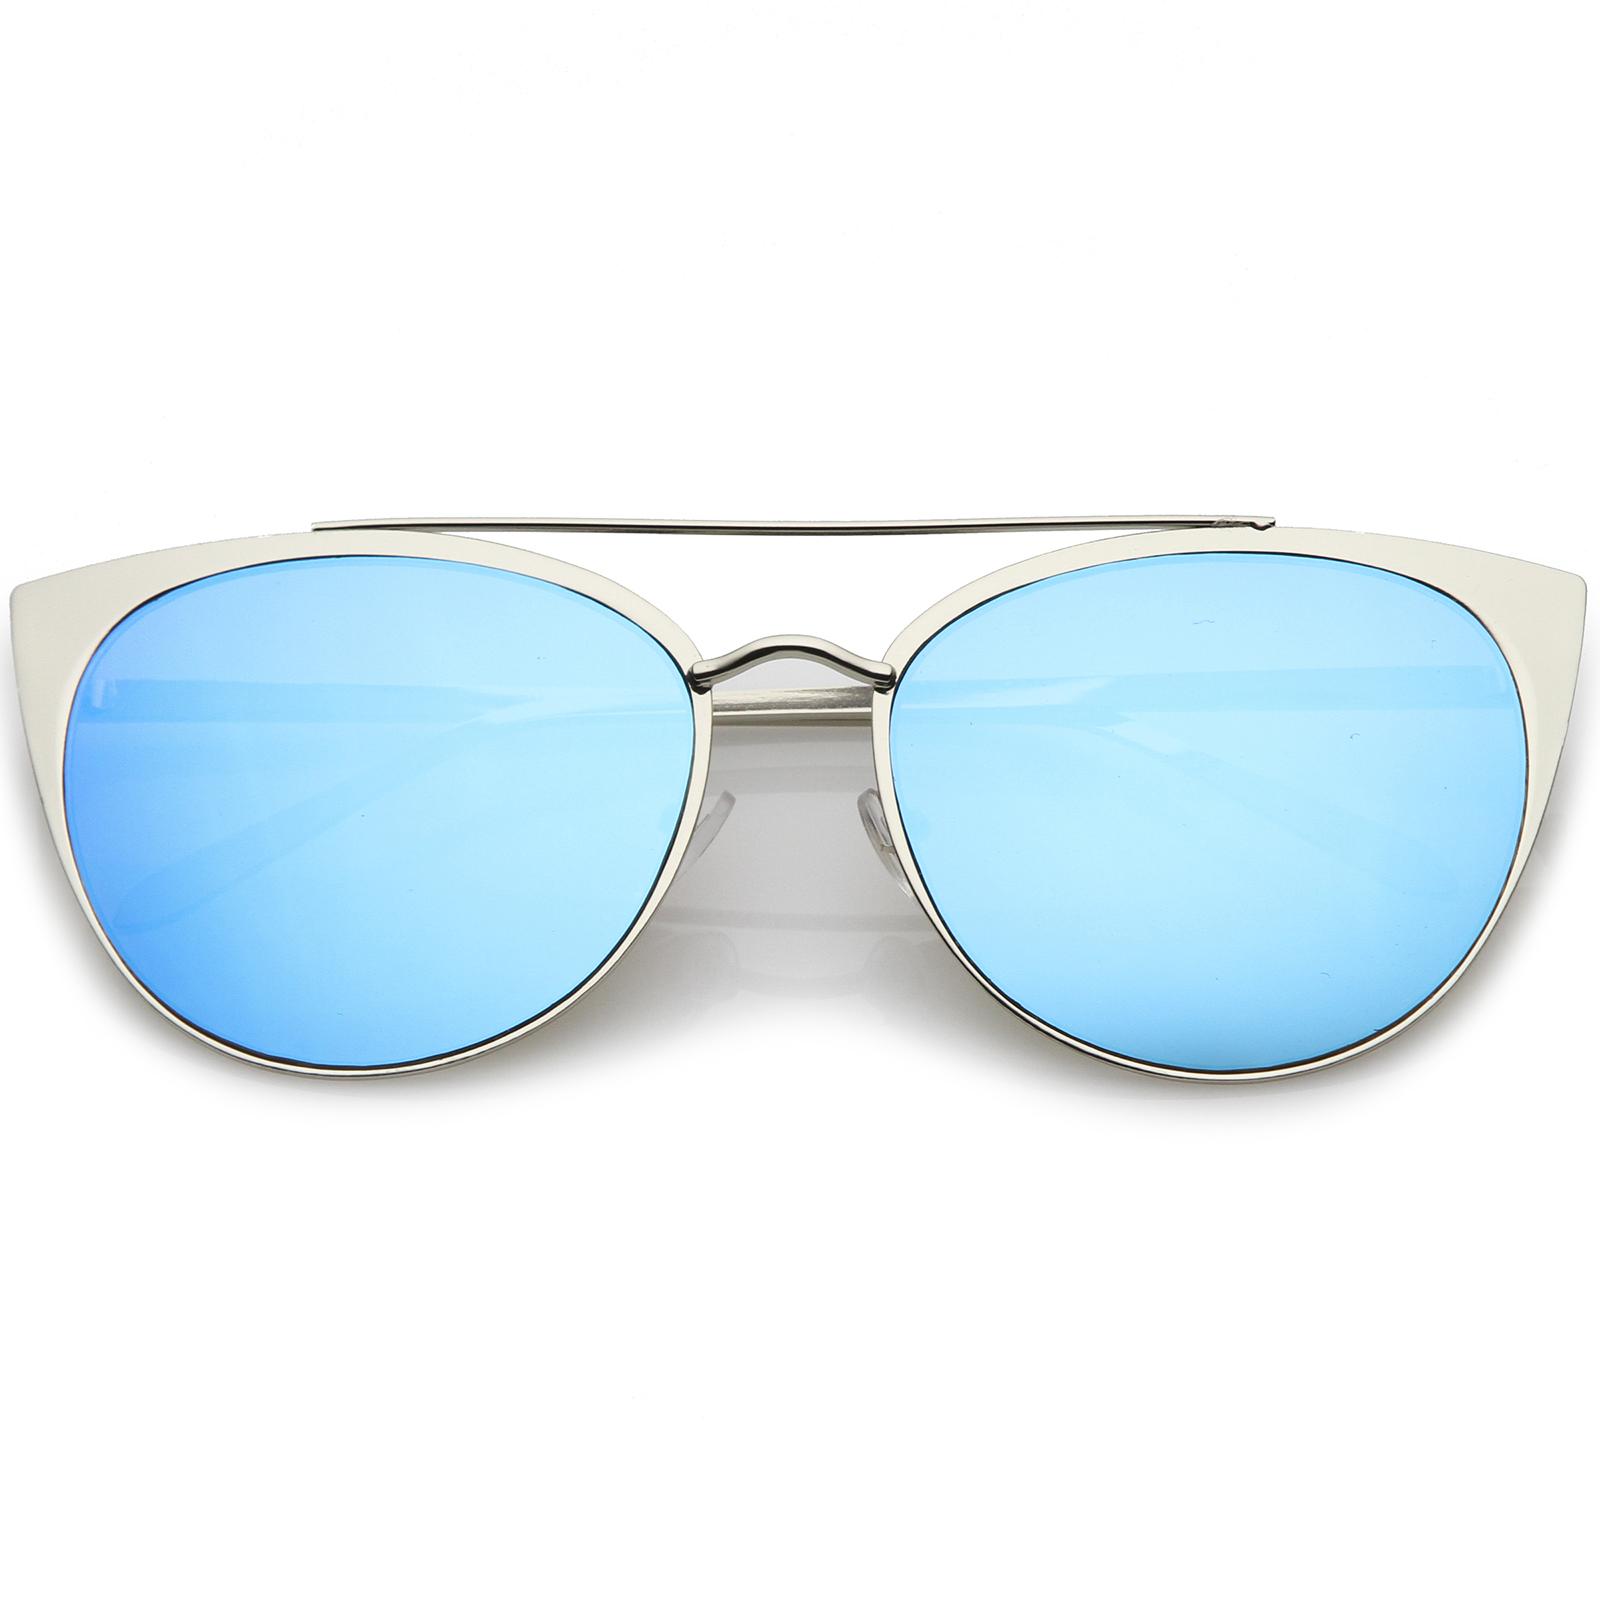 Metal Cat Eye Sunglasses  sunglassla women 039 s oversize metal crossbar mirrored flat lens